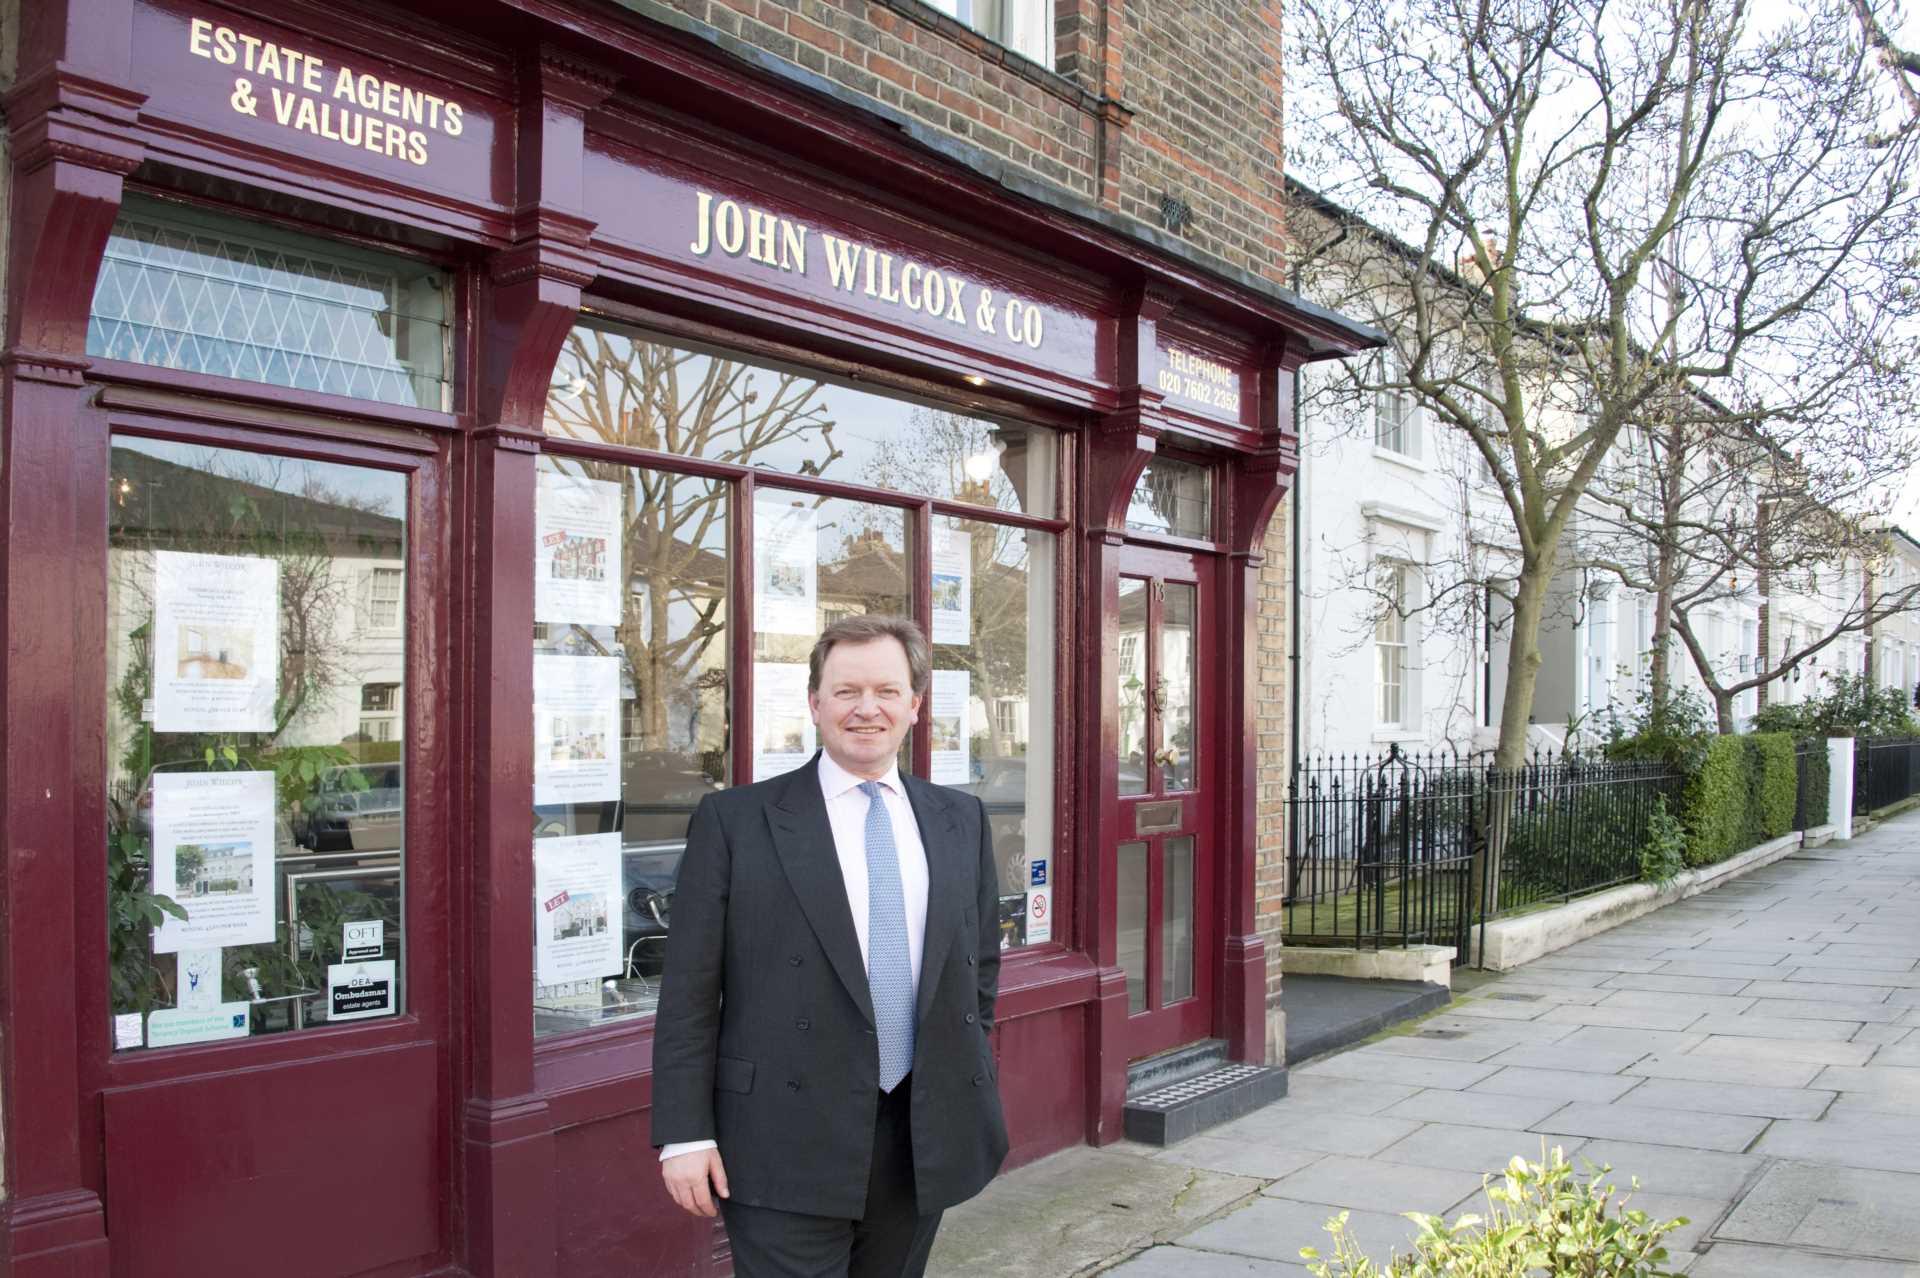 London Property Market News February 2016